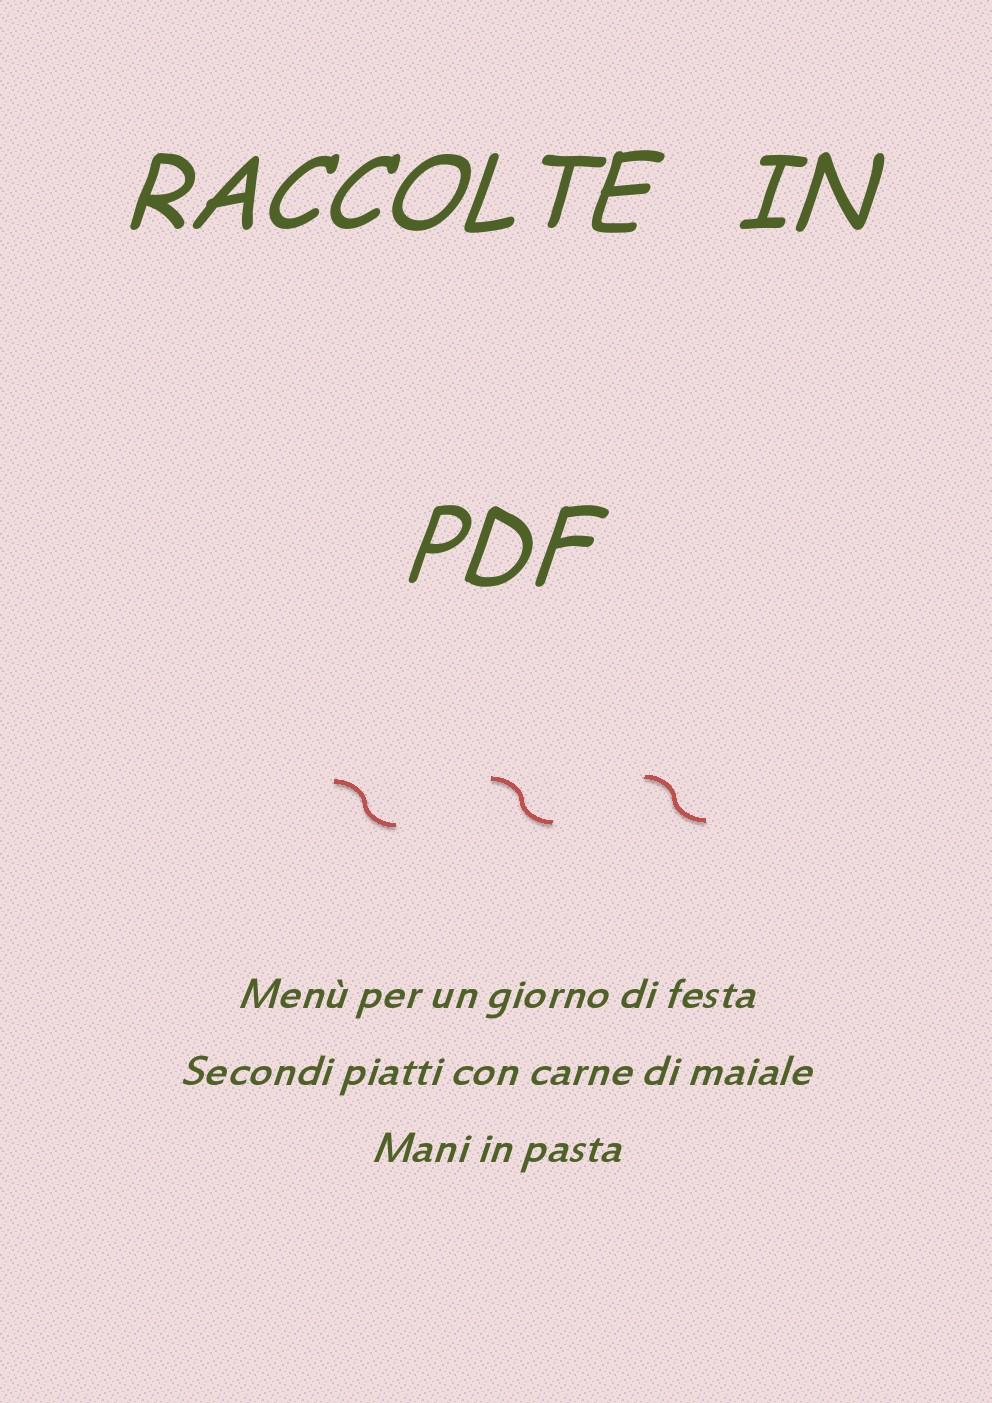 RACCOLTE IN PDF